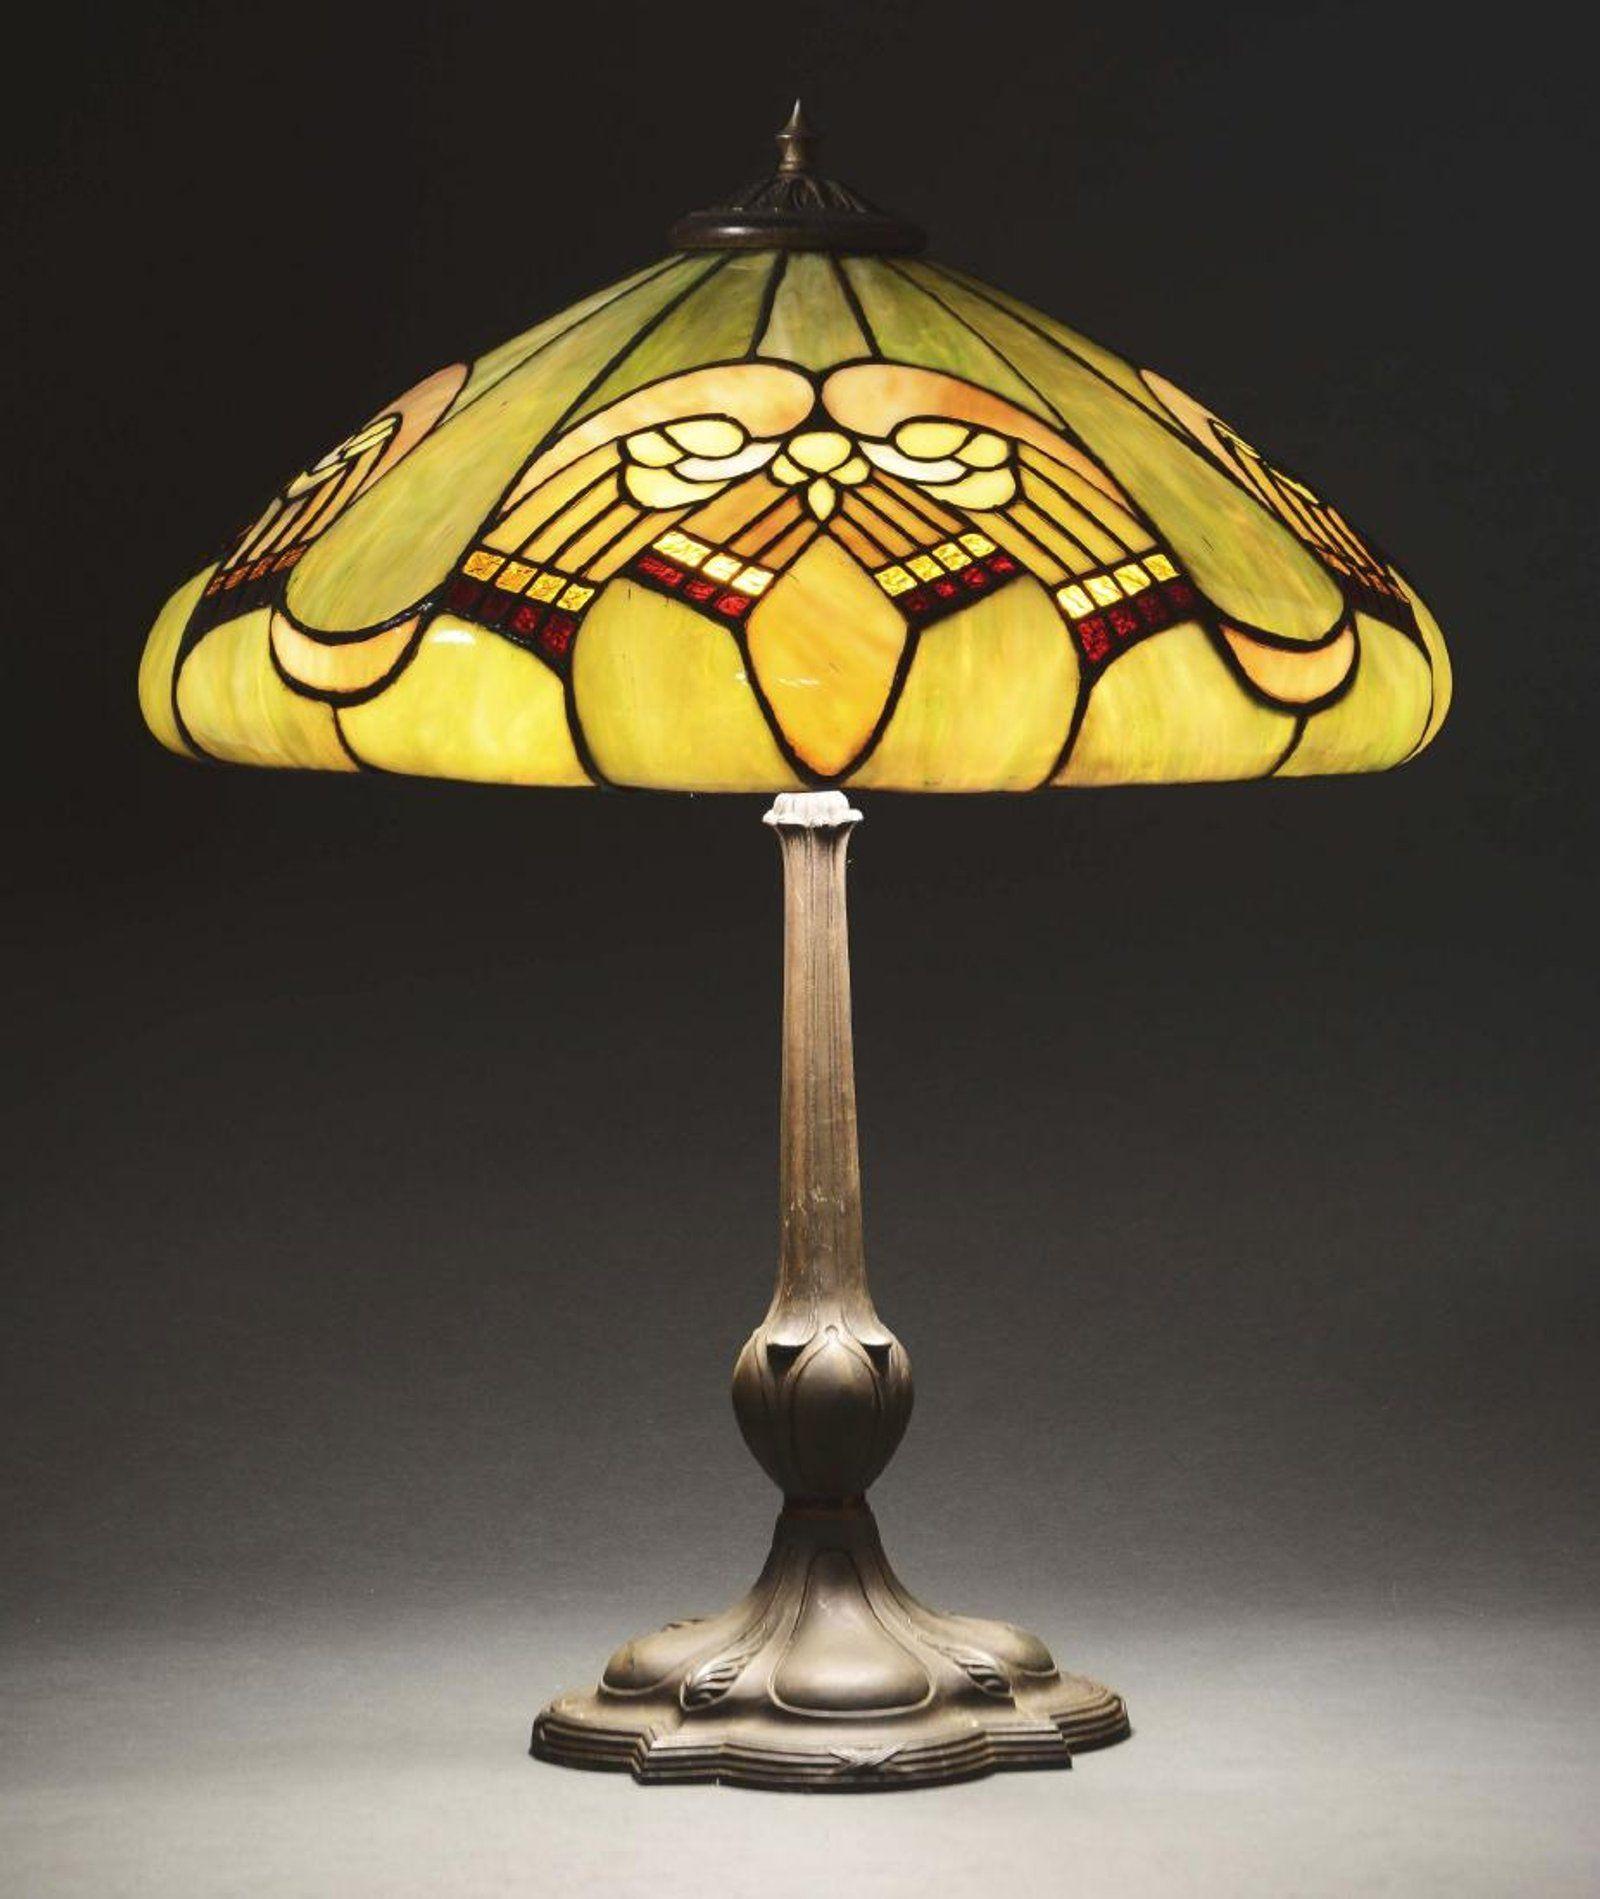 J A Whaley Leaded Table Lamp Jun 21 2018 Dan Morphy Auctions In Pa Lamp Table Lamp Led Table Lamp